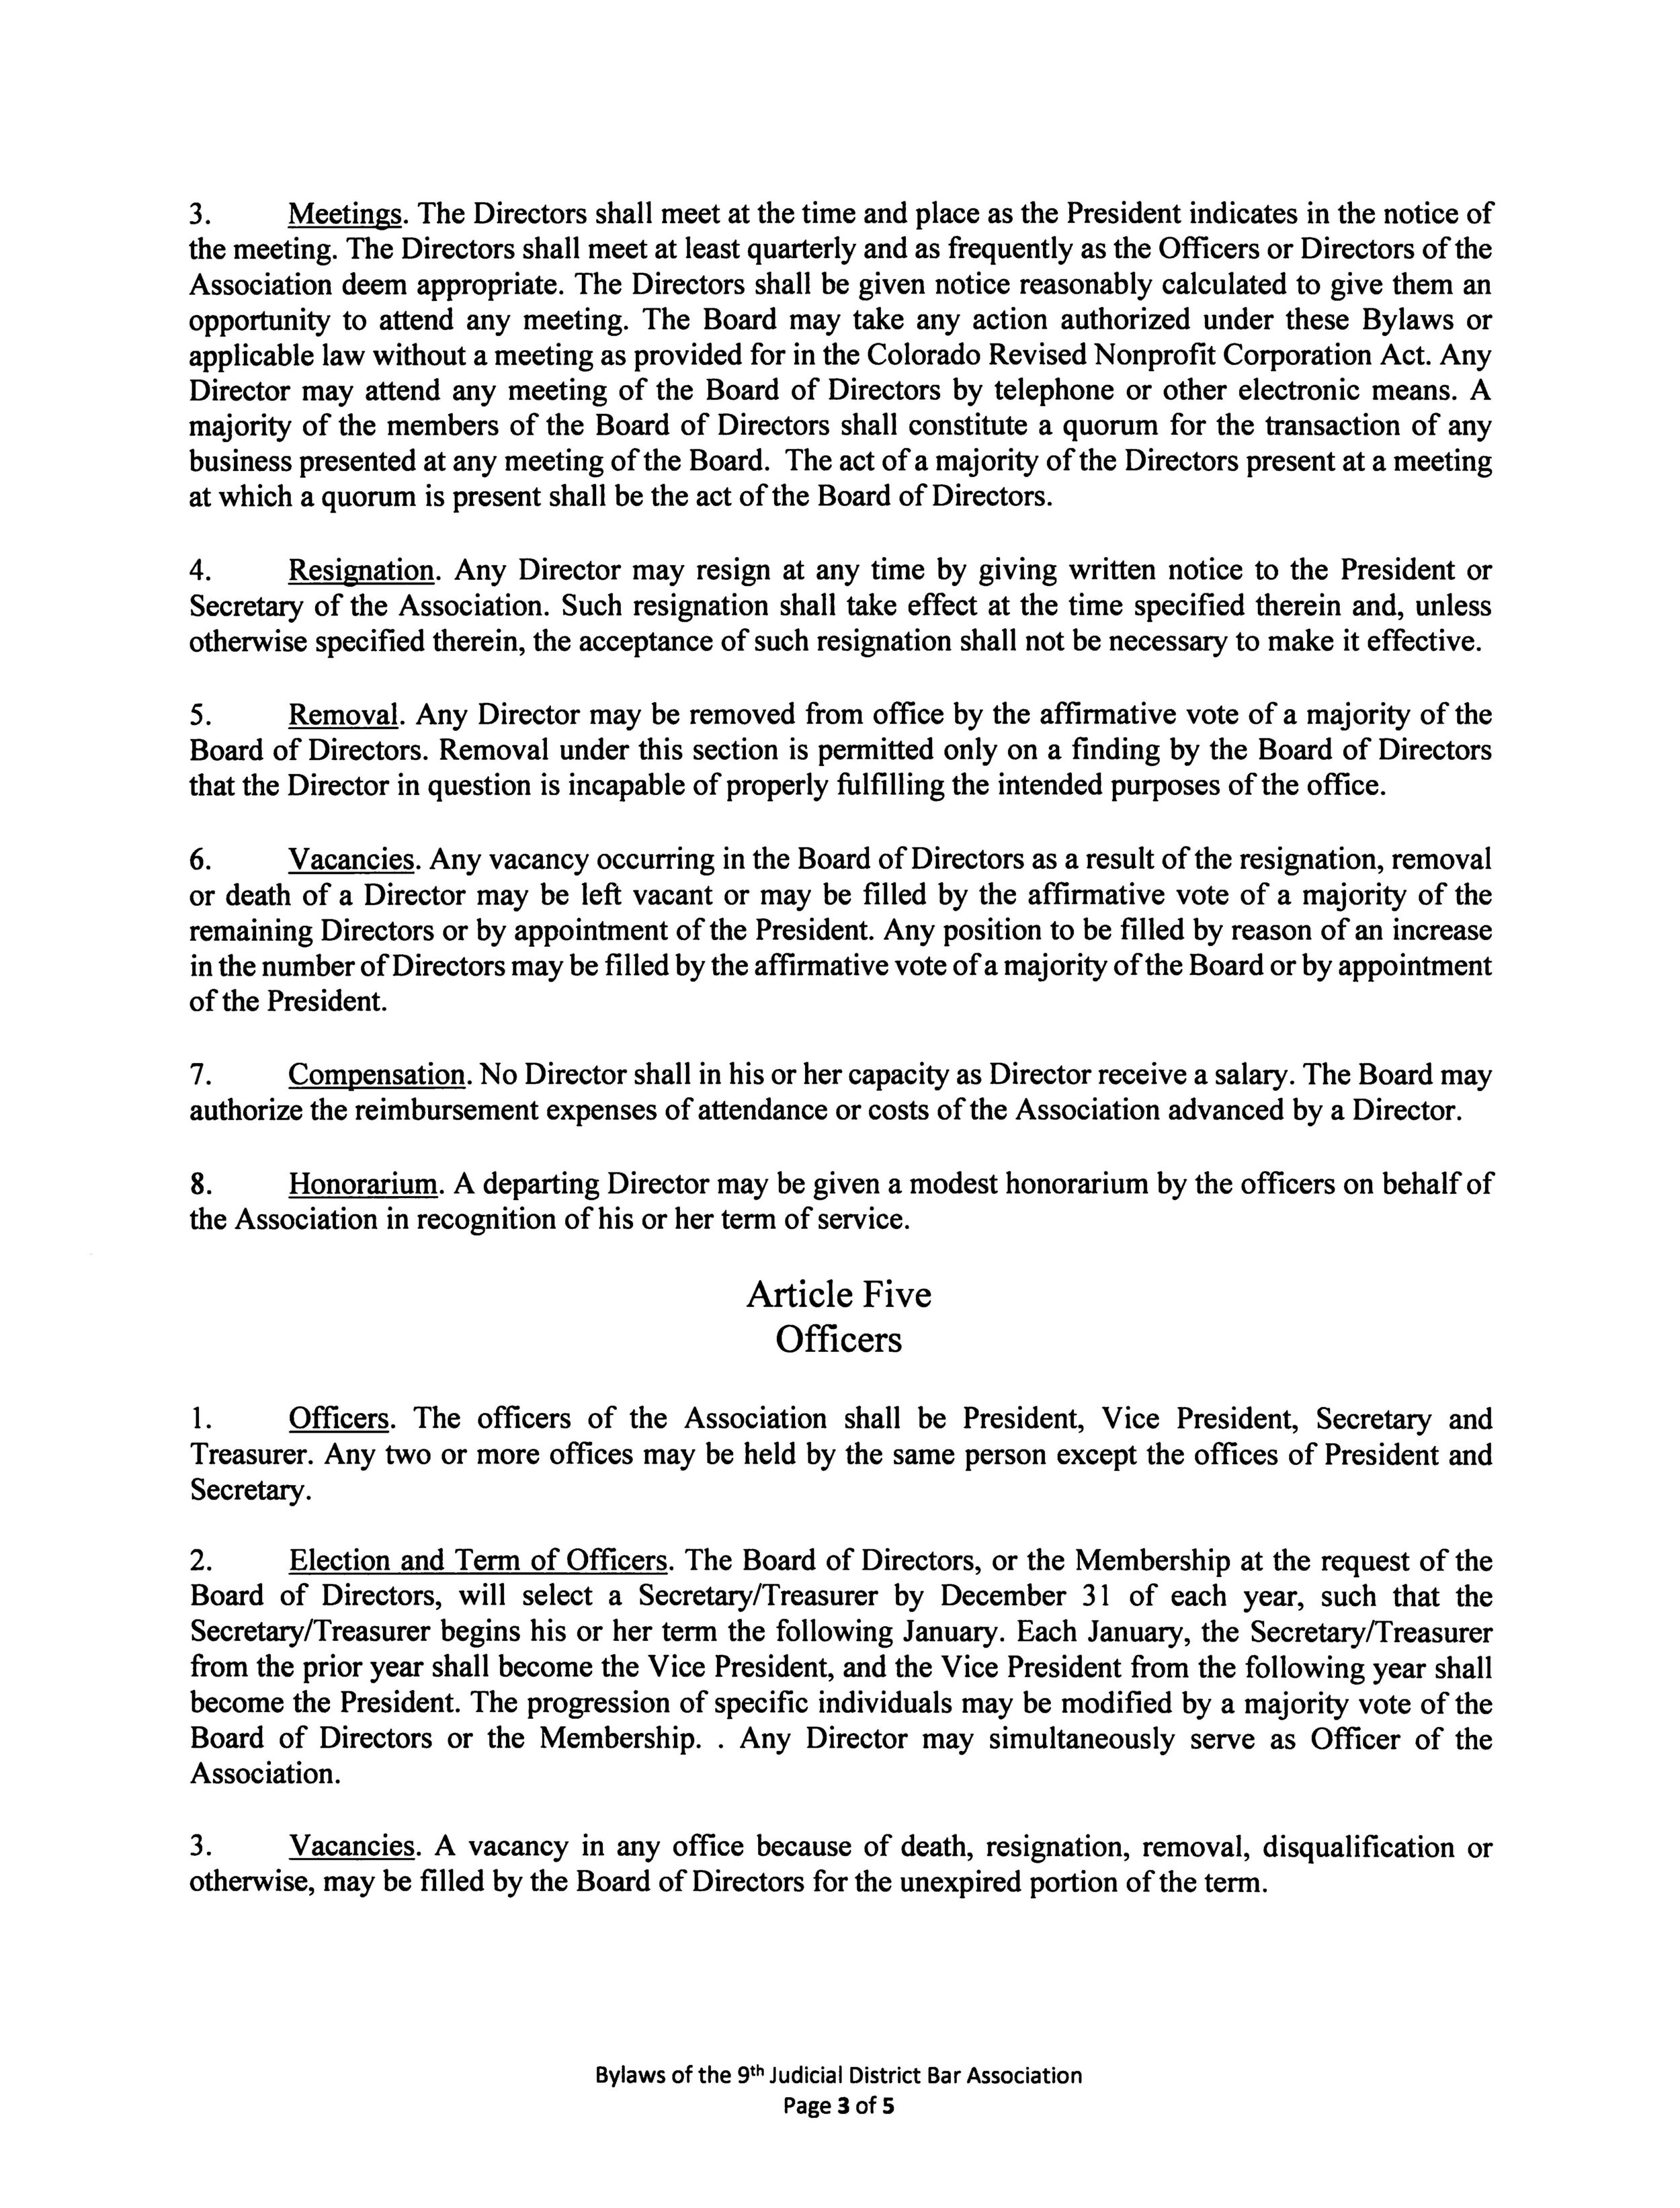 9JDBA Bylaws executed 3-7-17_Page_3.jpg